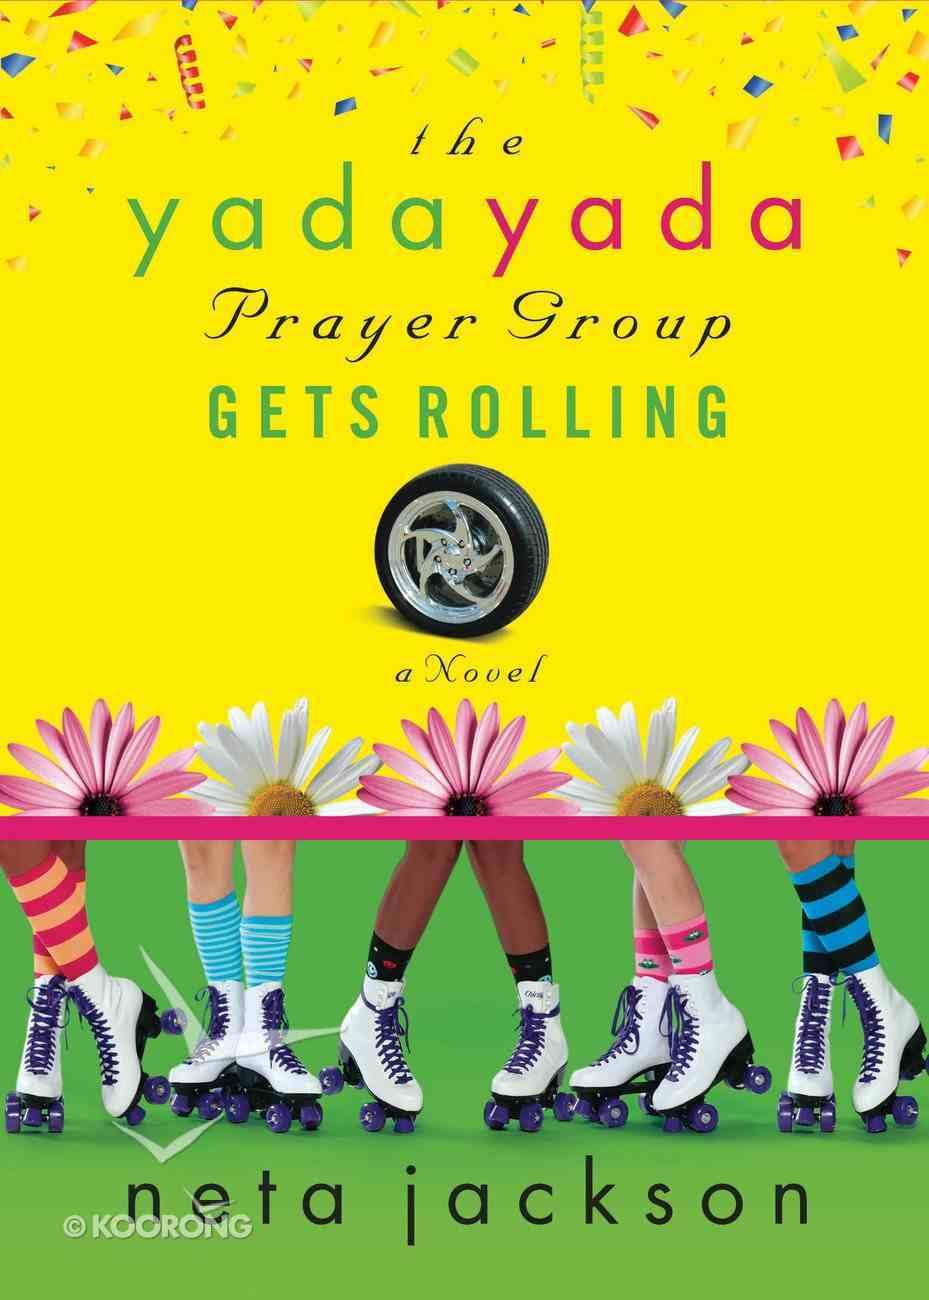 The Yada Yada Prayer Group Gets Rolling (Book 6) (Yada Yada Prayer Group Series) eBook